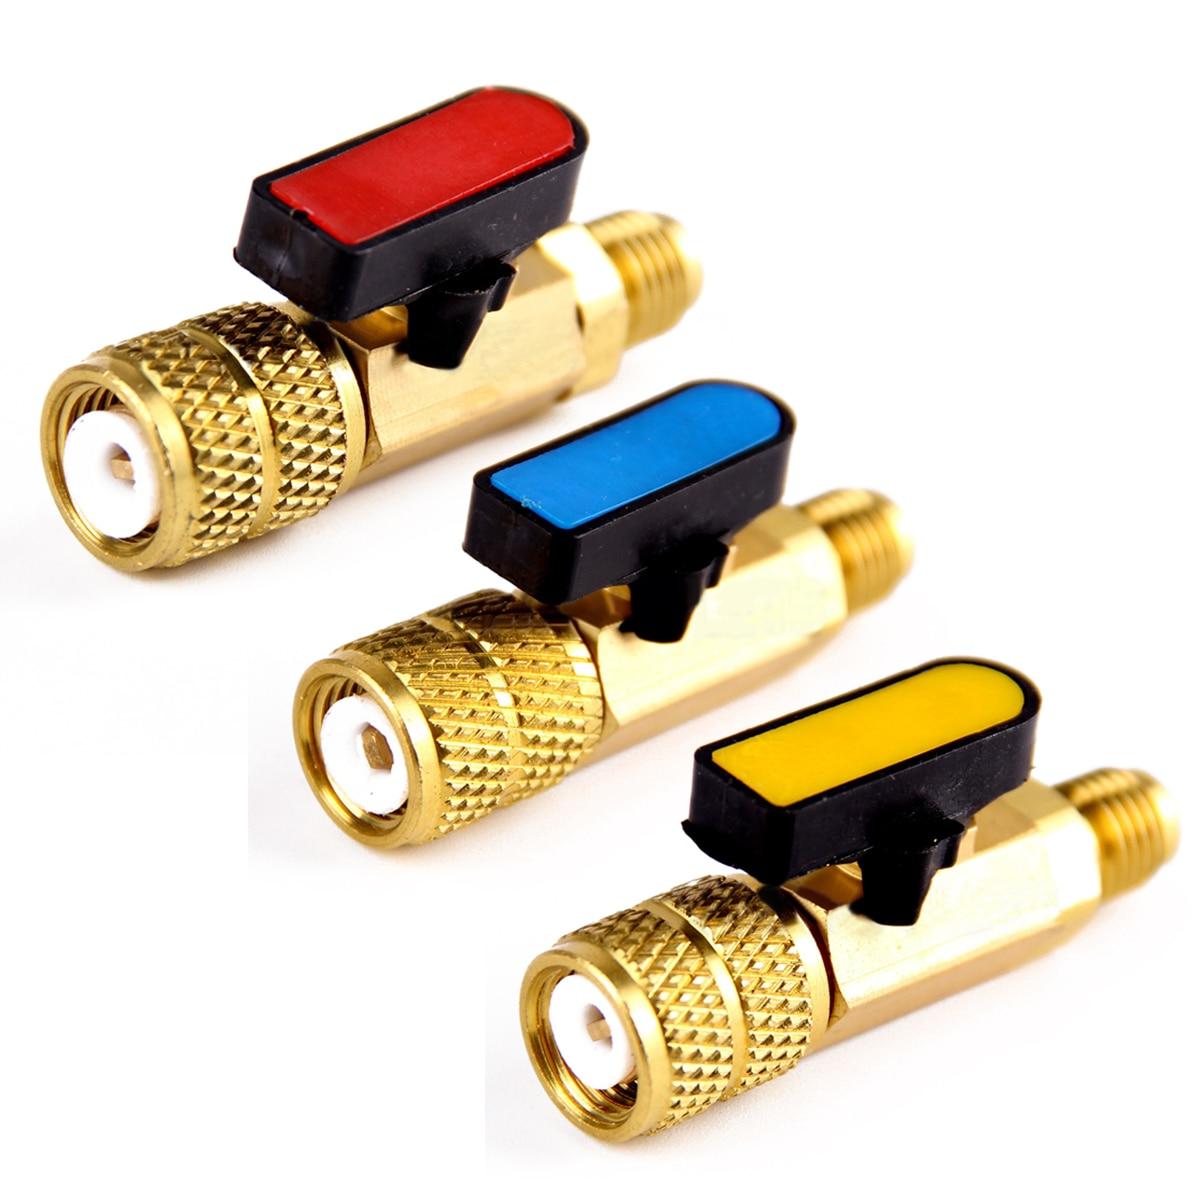 3Pcs/Set Brass R410A Refrigerant Straight Ball Valves AC Charging Hoses Brass 1/4